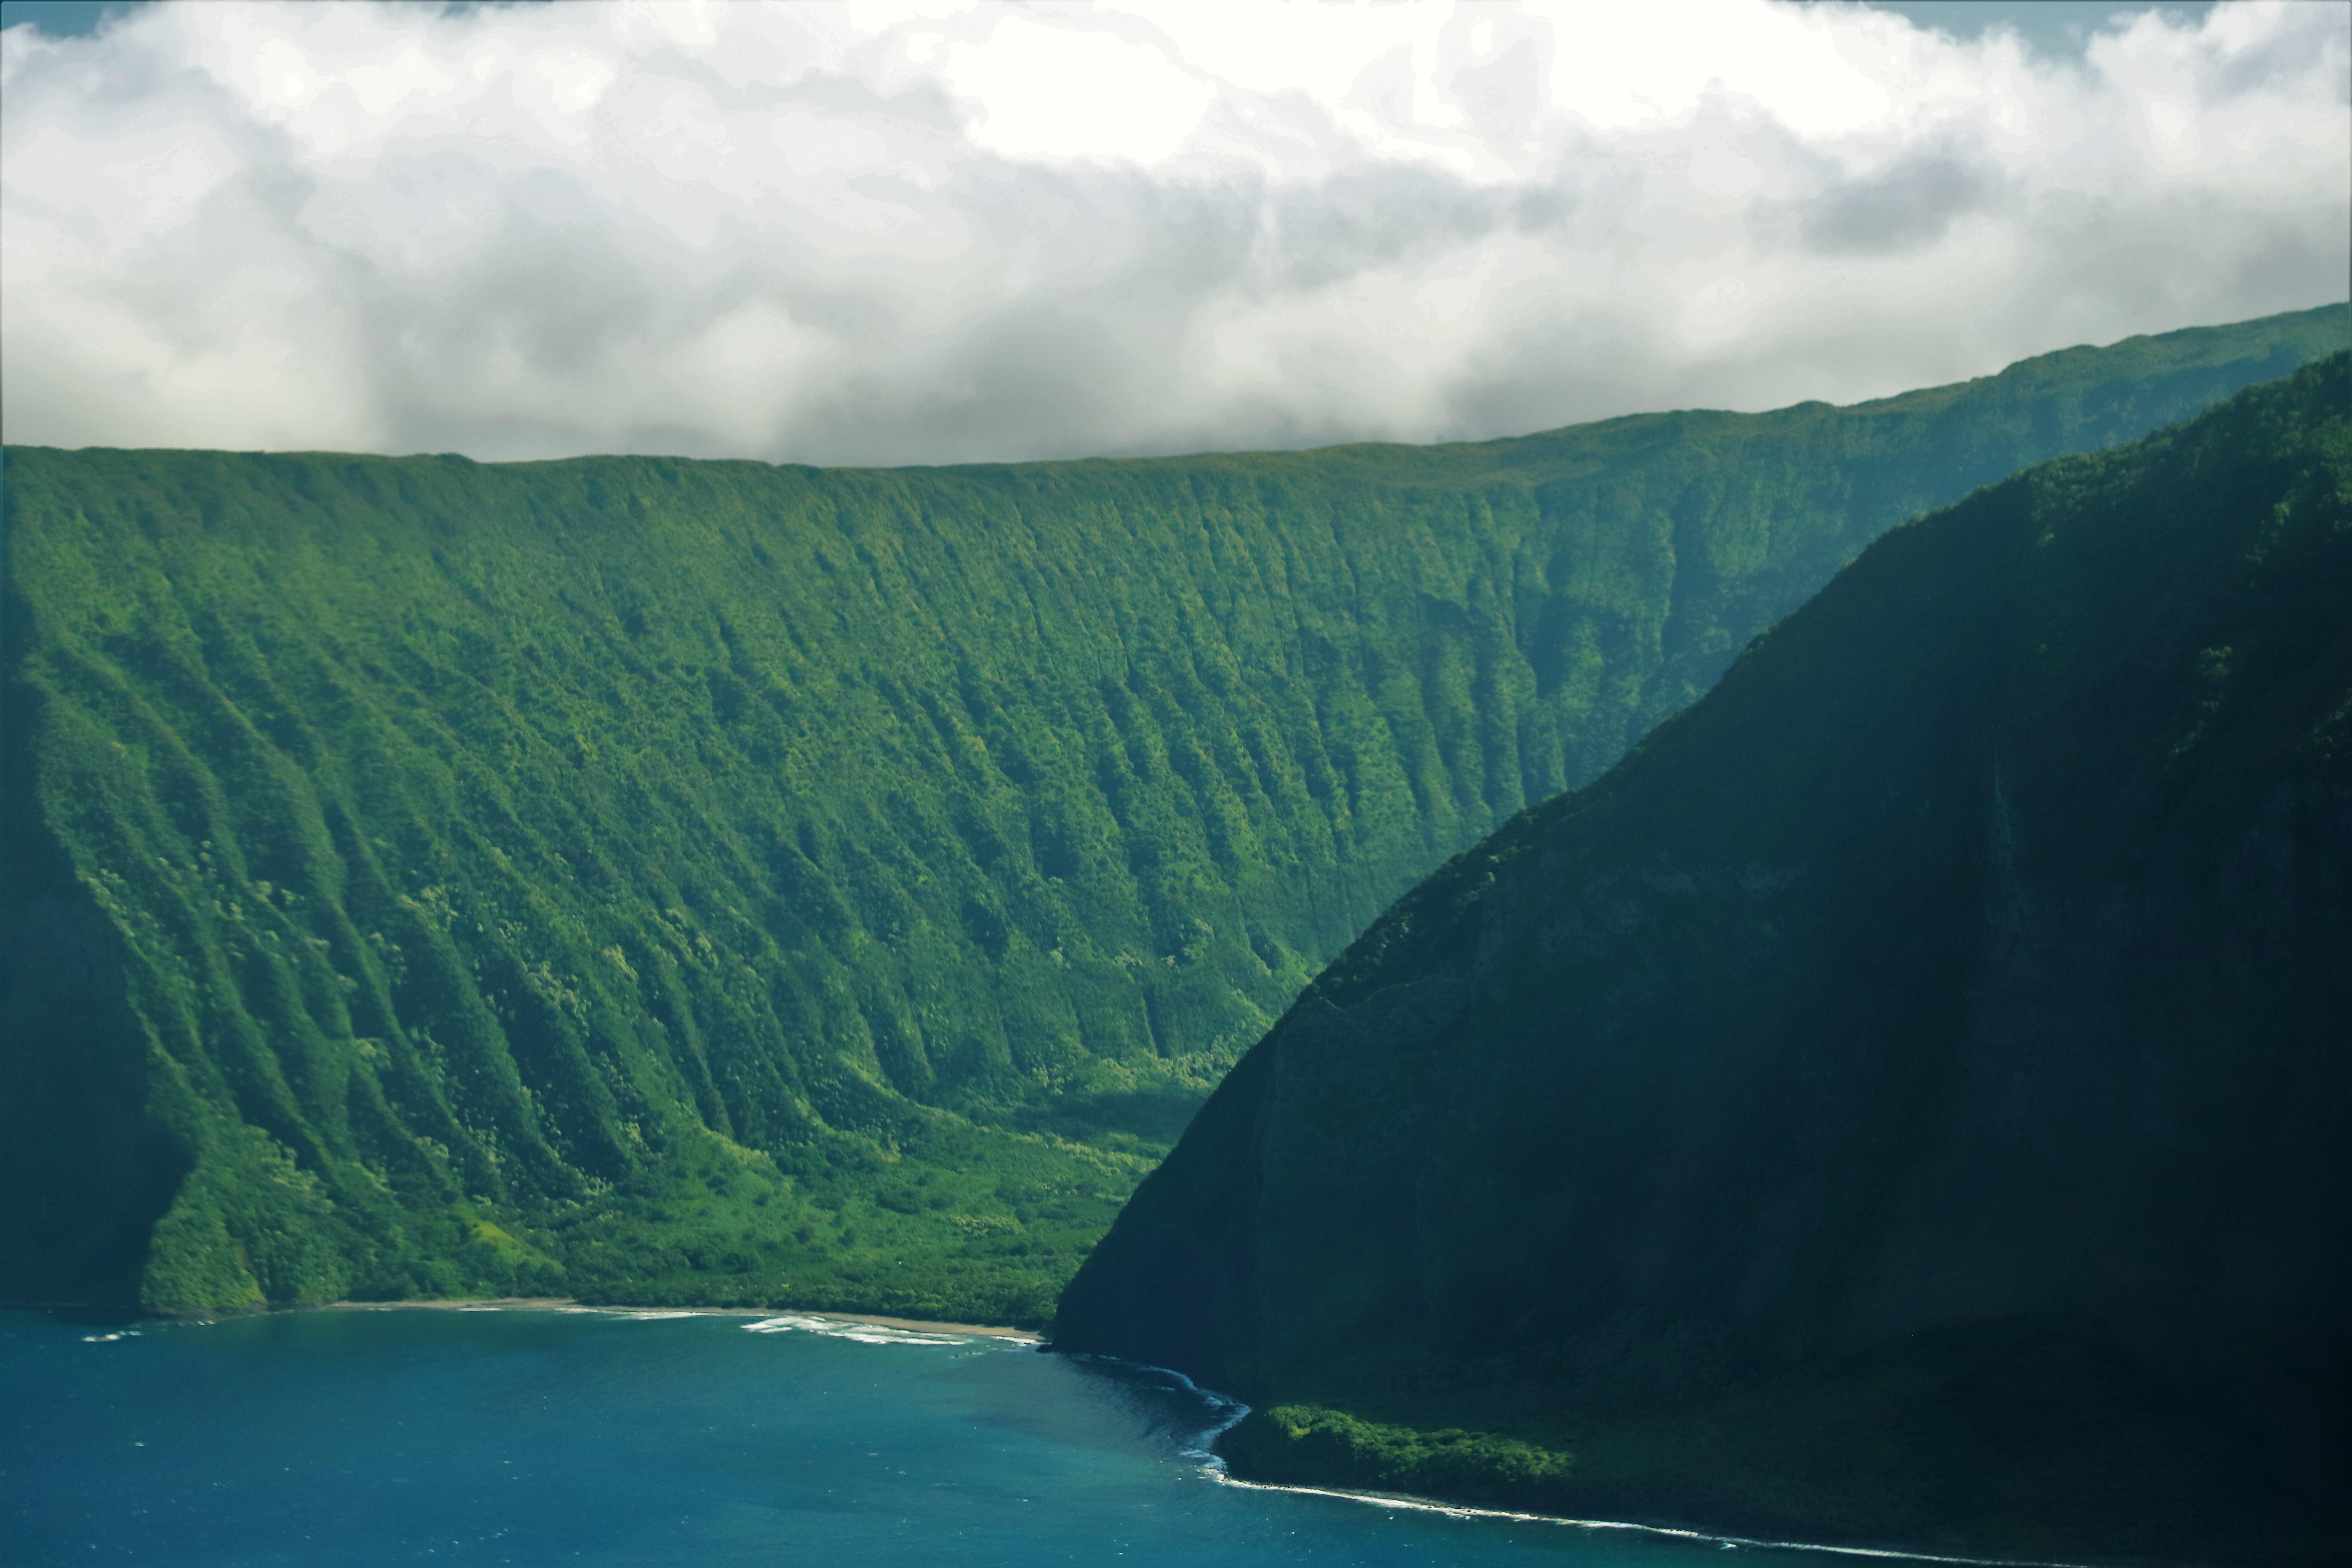 2018 11 24 61 Molokai to Maui HI.JPG